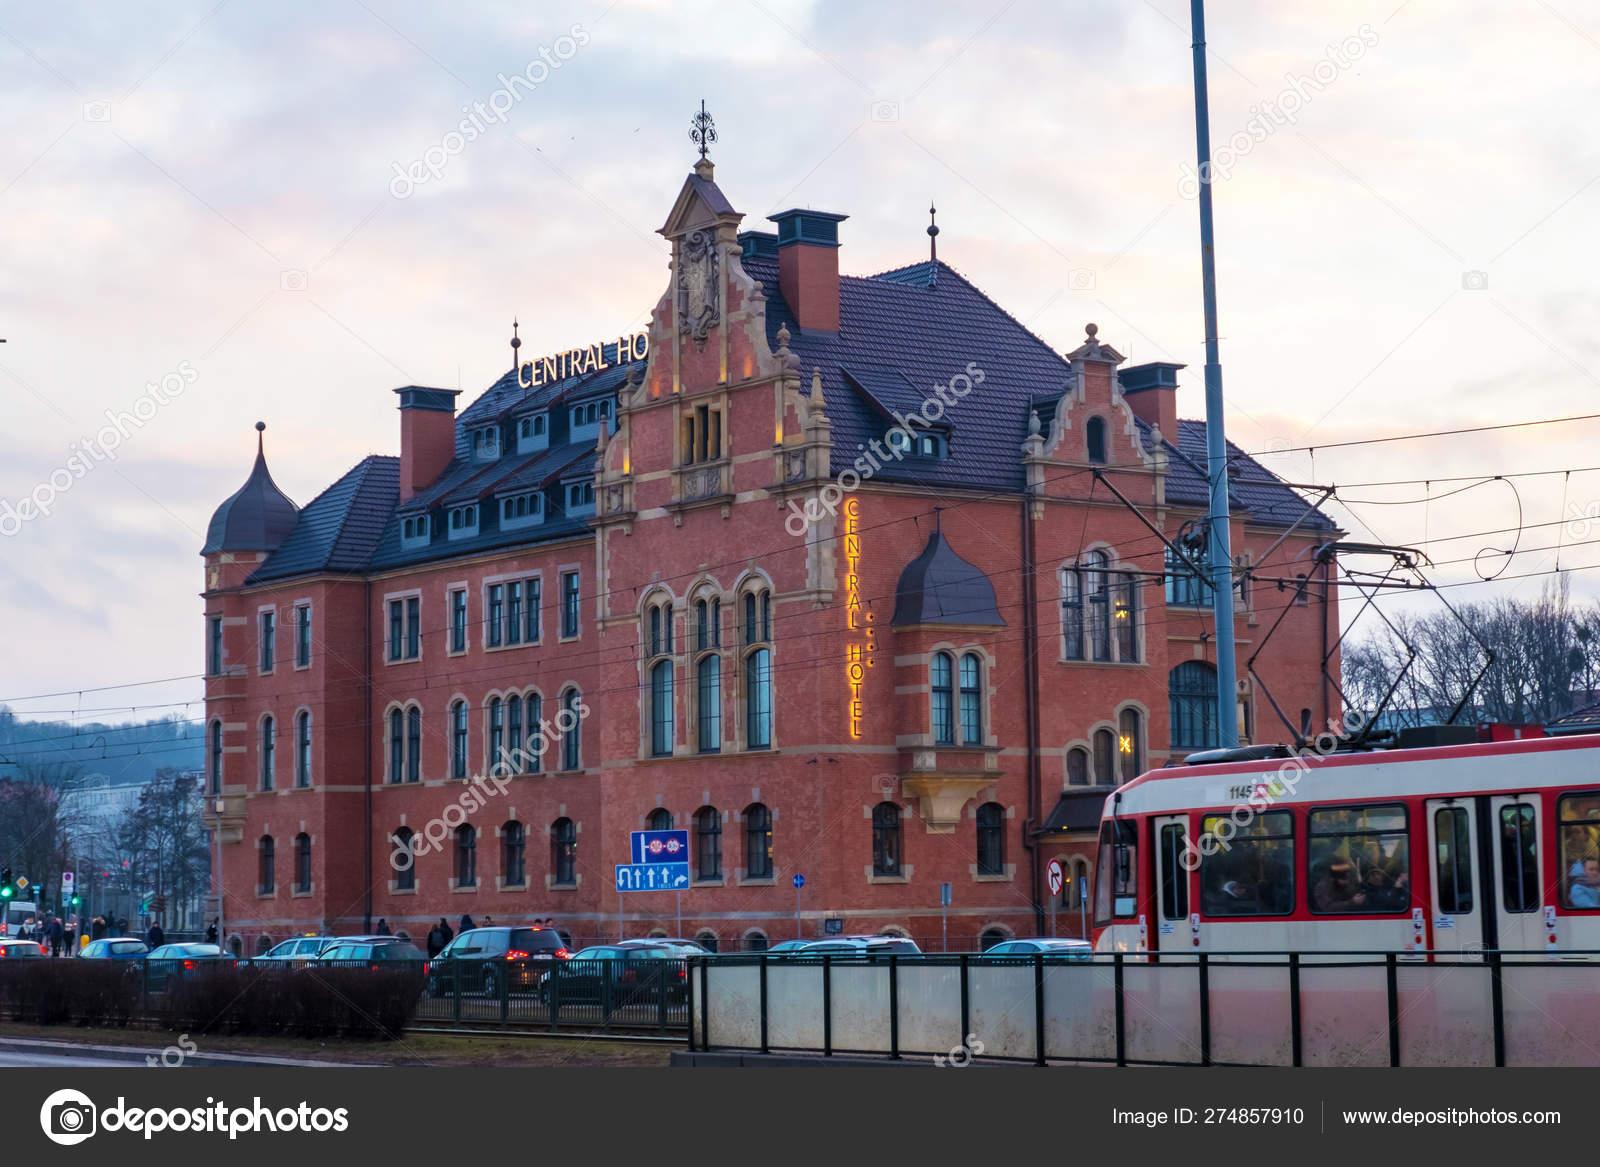 Central Hotel Near The Main Railway Station Of Gdansk Poland